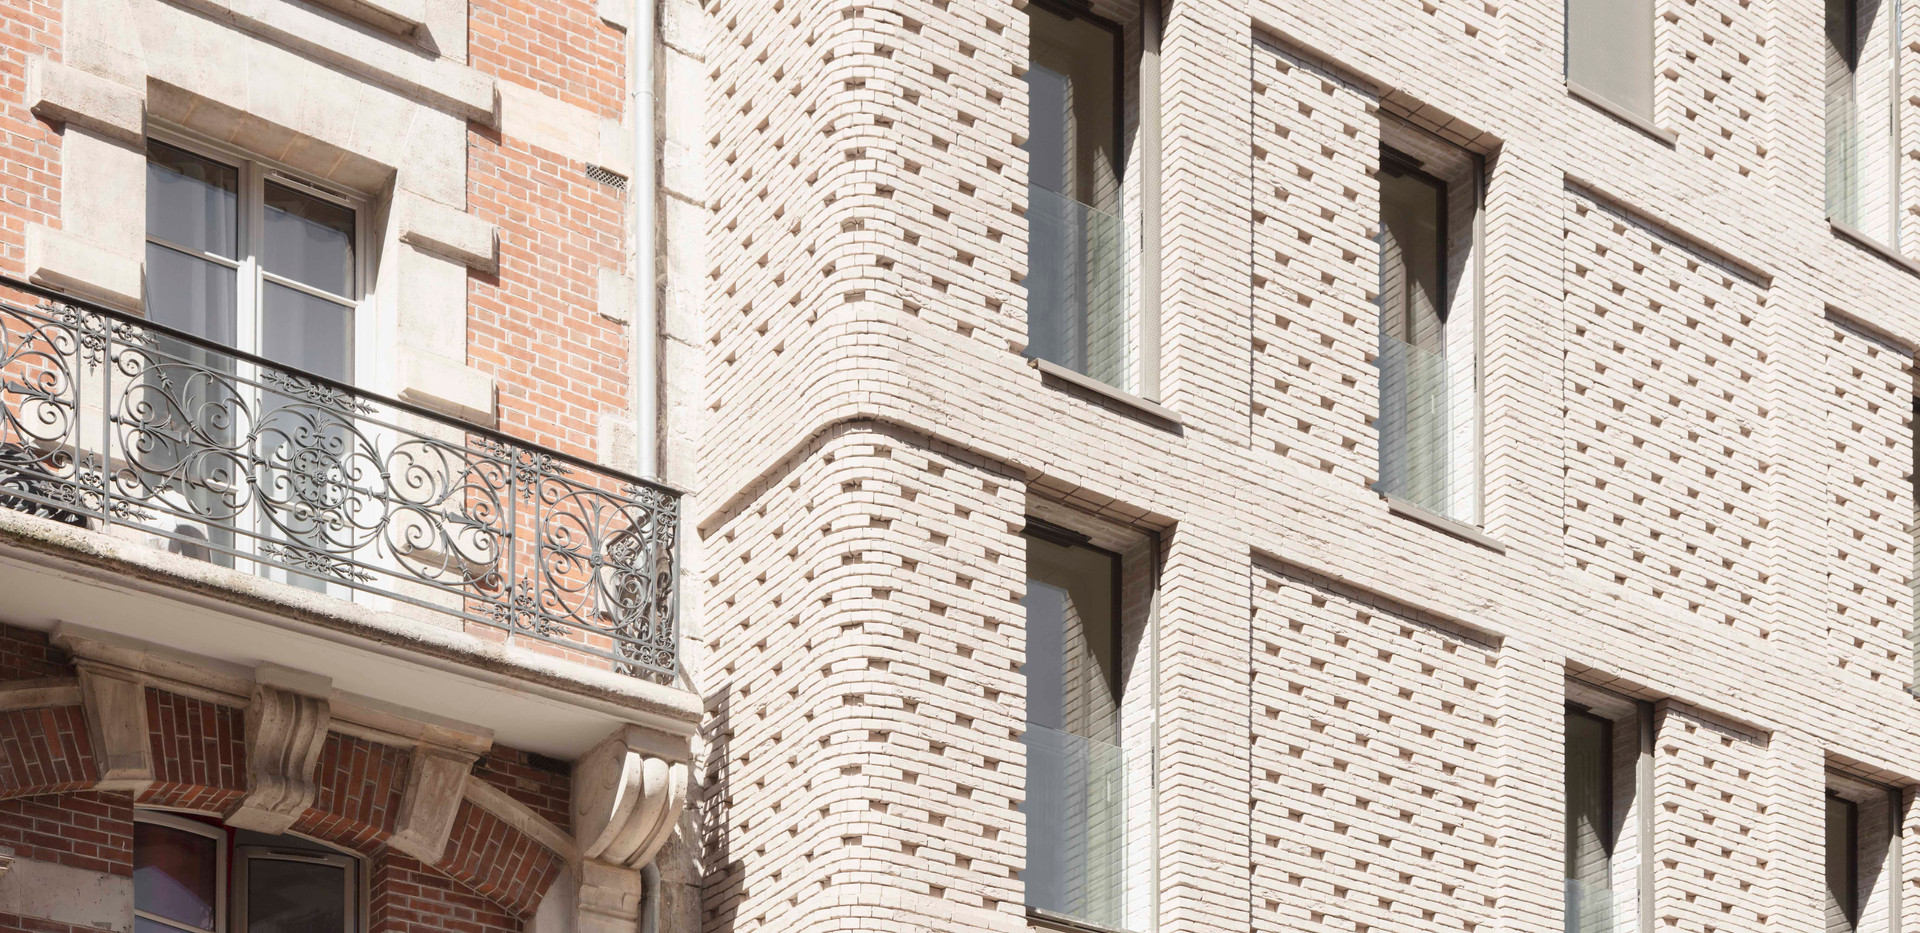 Avenier_Cornejo_Architectes_-Charenton_A